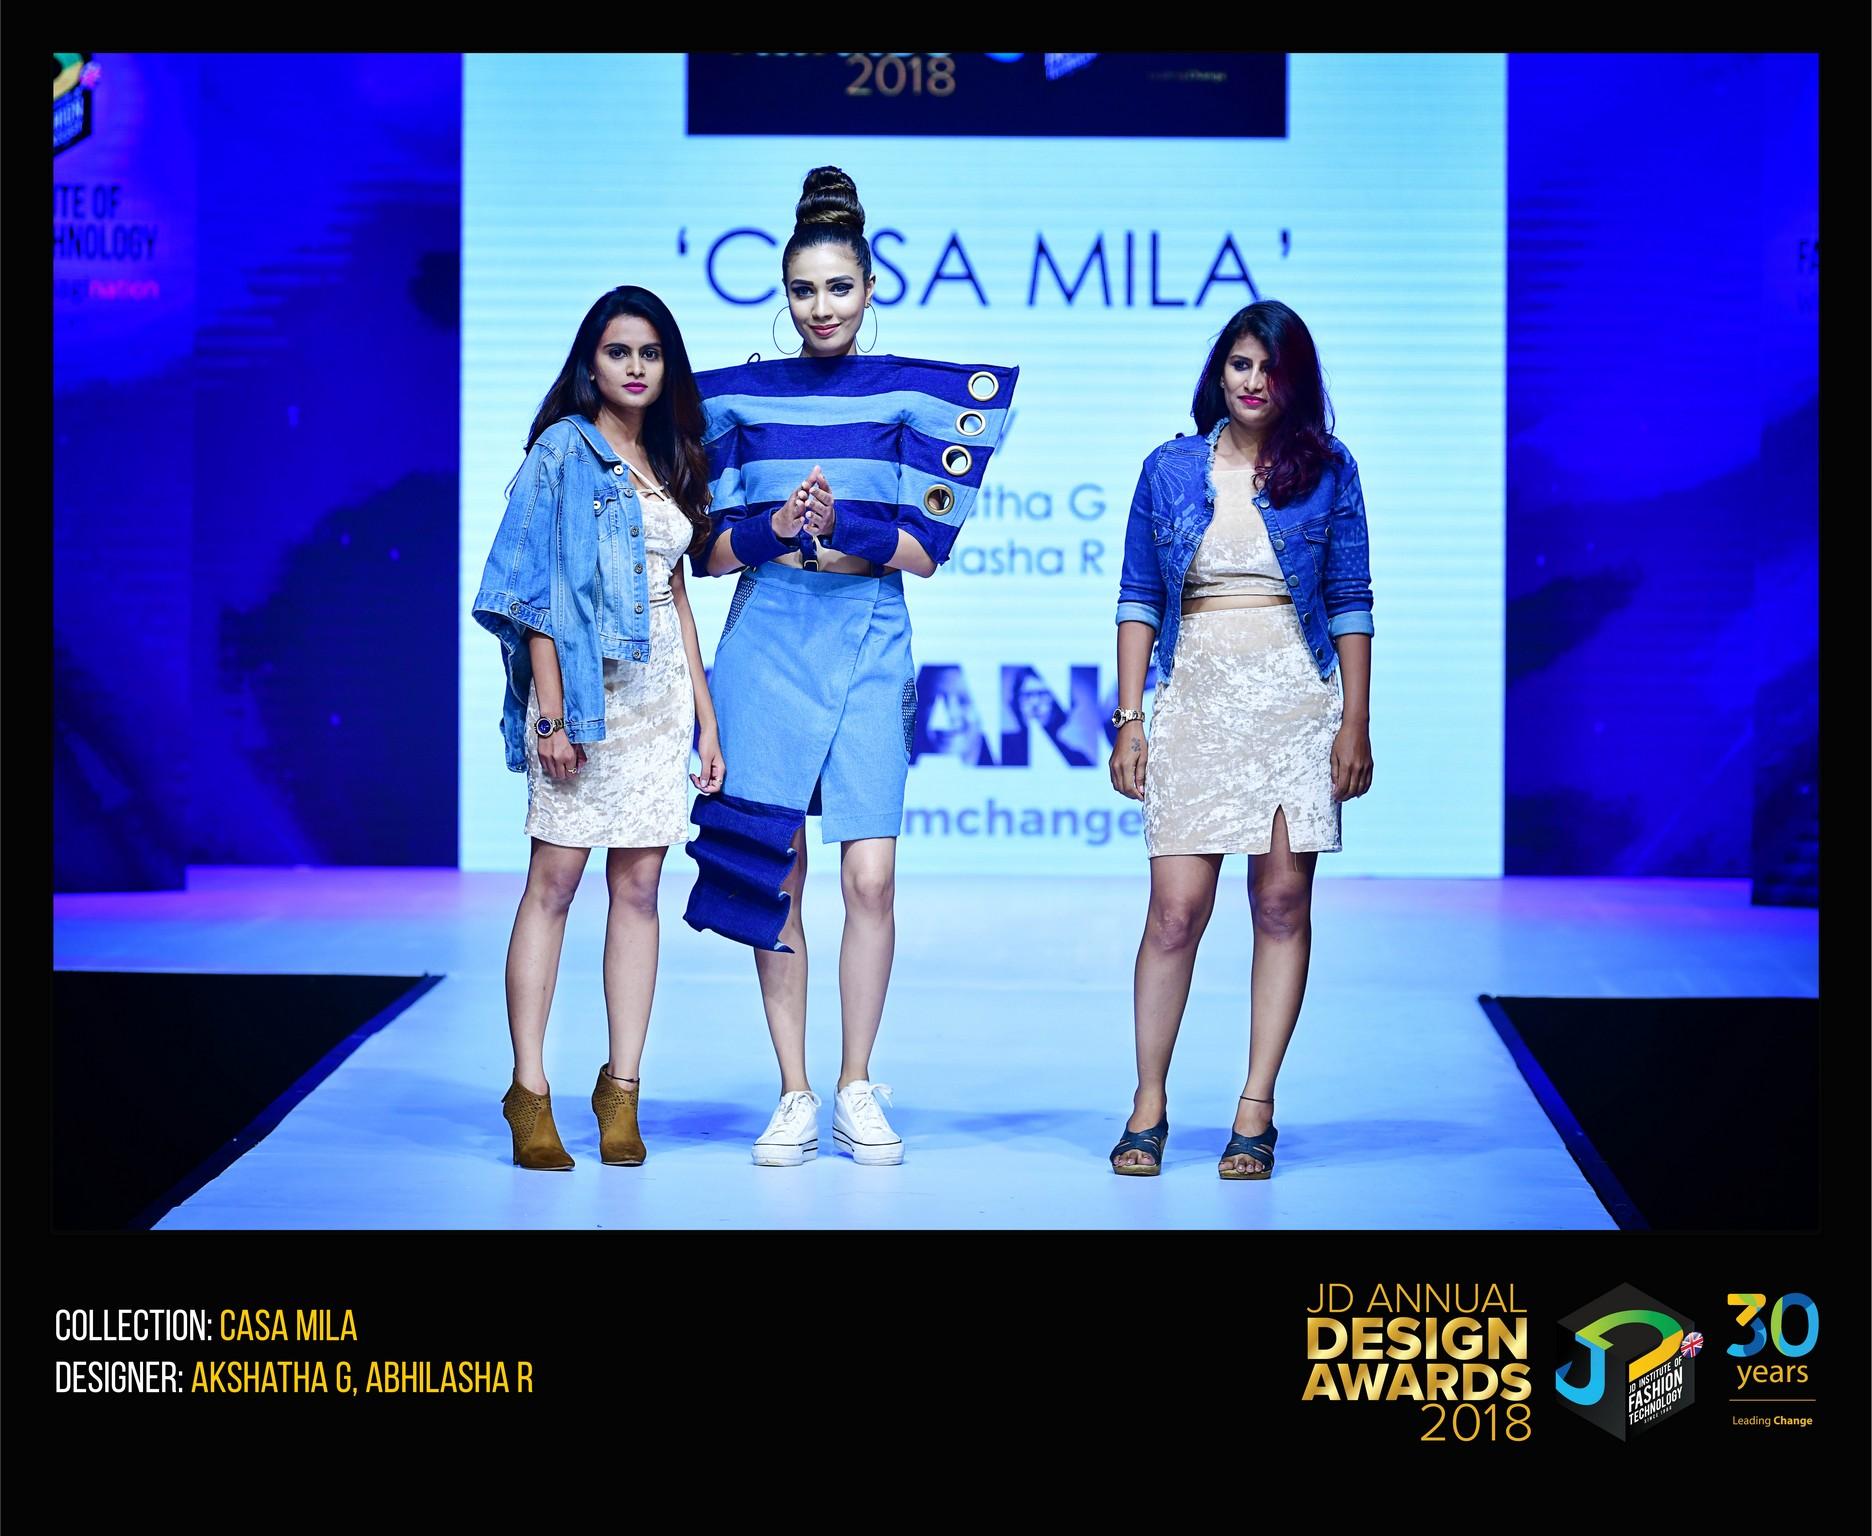 Casa Mila – Change – JD Annual Design Awards 2018 | Designer: Akshata, Sapna and Abhilasha | Photography : Jerin Nath (@jerin_nath) casa mila – change – jd annual design awards 2018 Casa Mila – Change – JD Annual Design Awards 2018 CASA MILA 8